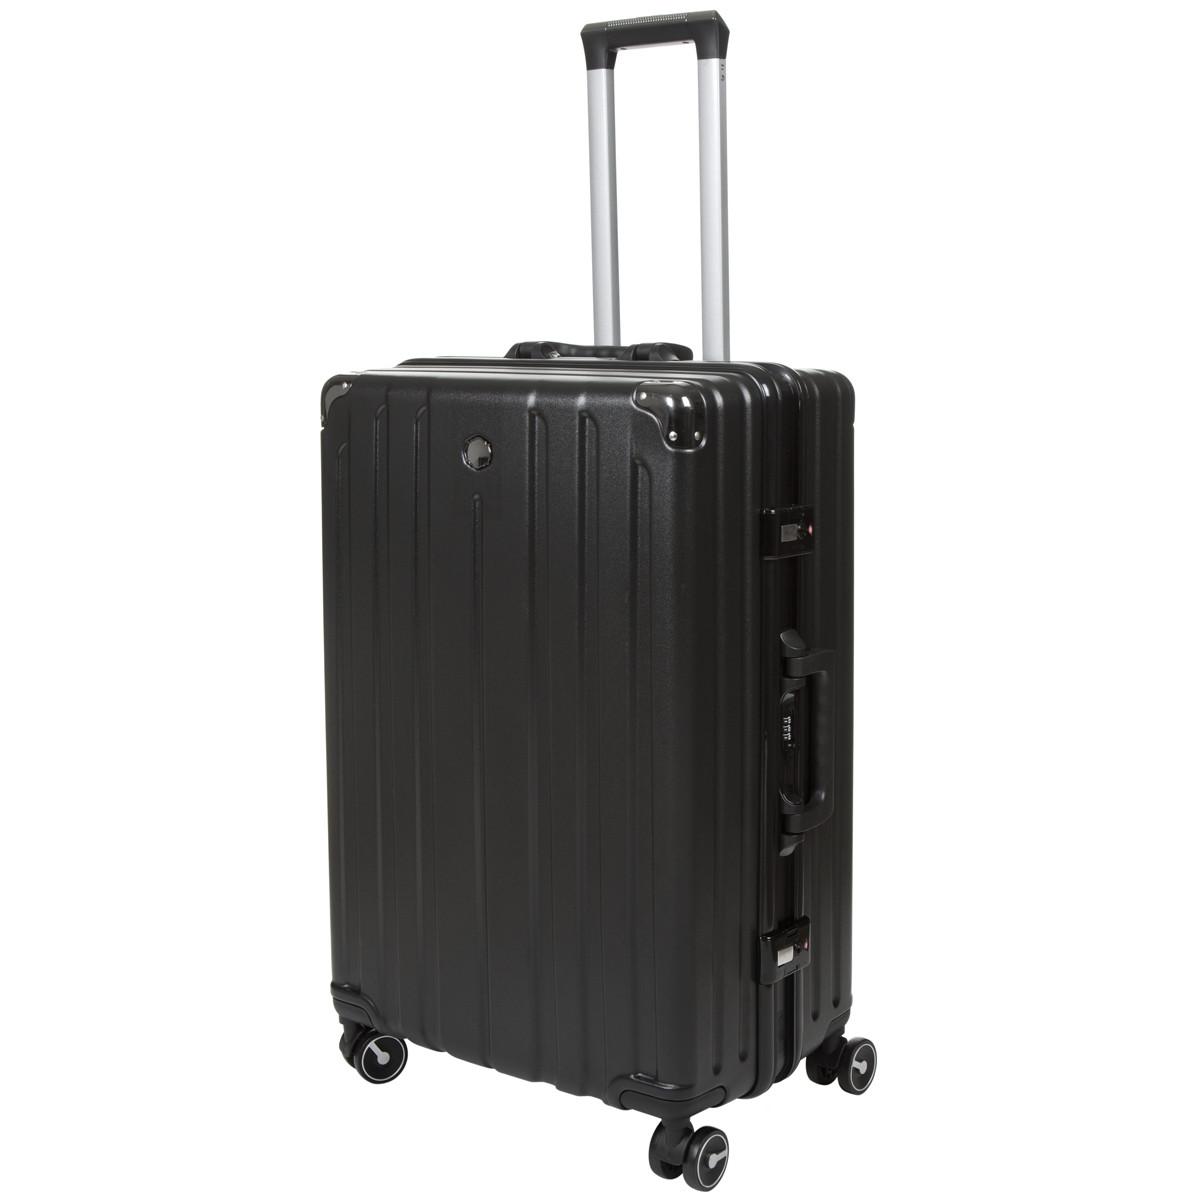 Чемодан большой алюминиевый каркас чёрный OUPAI 46х72х29 пластик ABS   кс1106-1чб